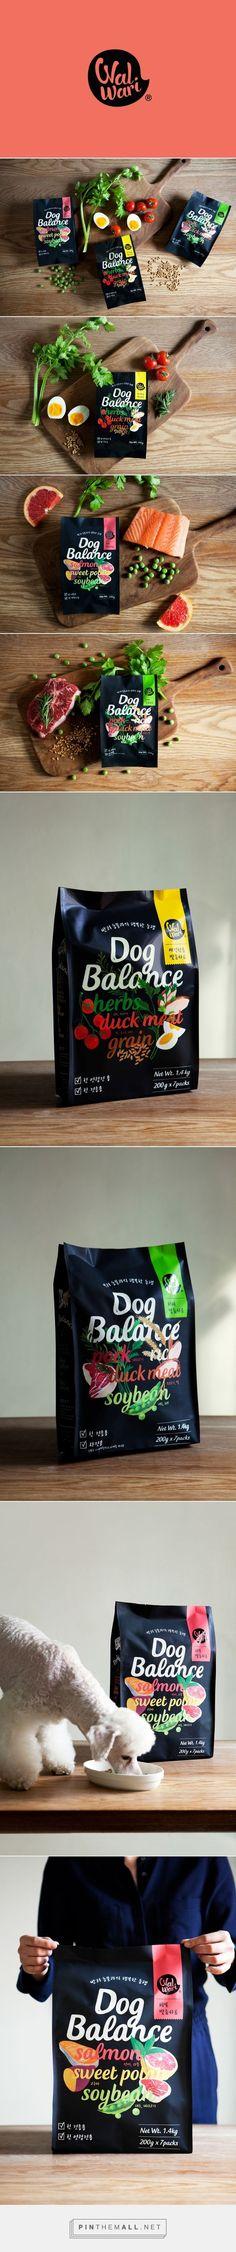 Dog Balance / pet food by Charry Jeon, Saerom Kang, ContentFormContext, KIWOONG HONG: